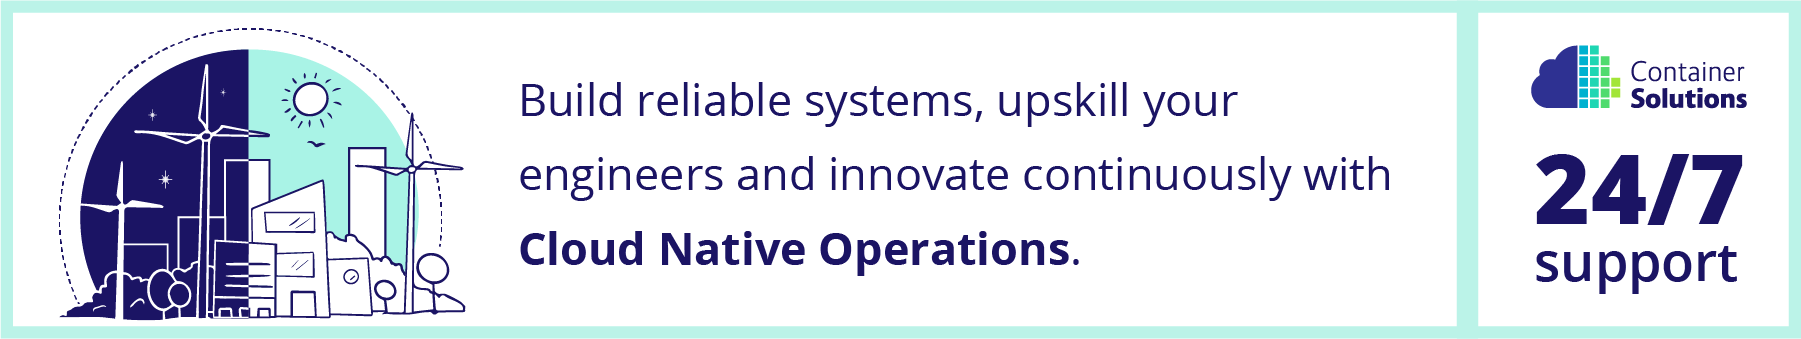 cloud-native-operations